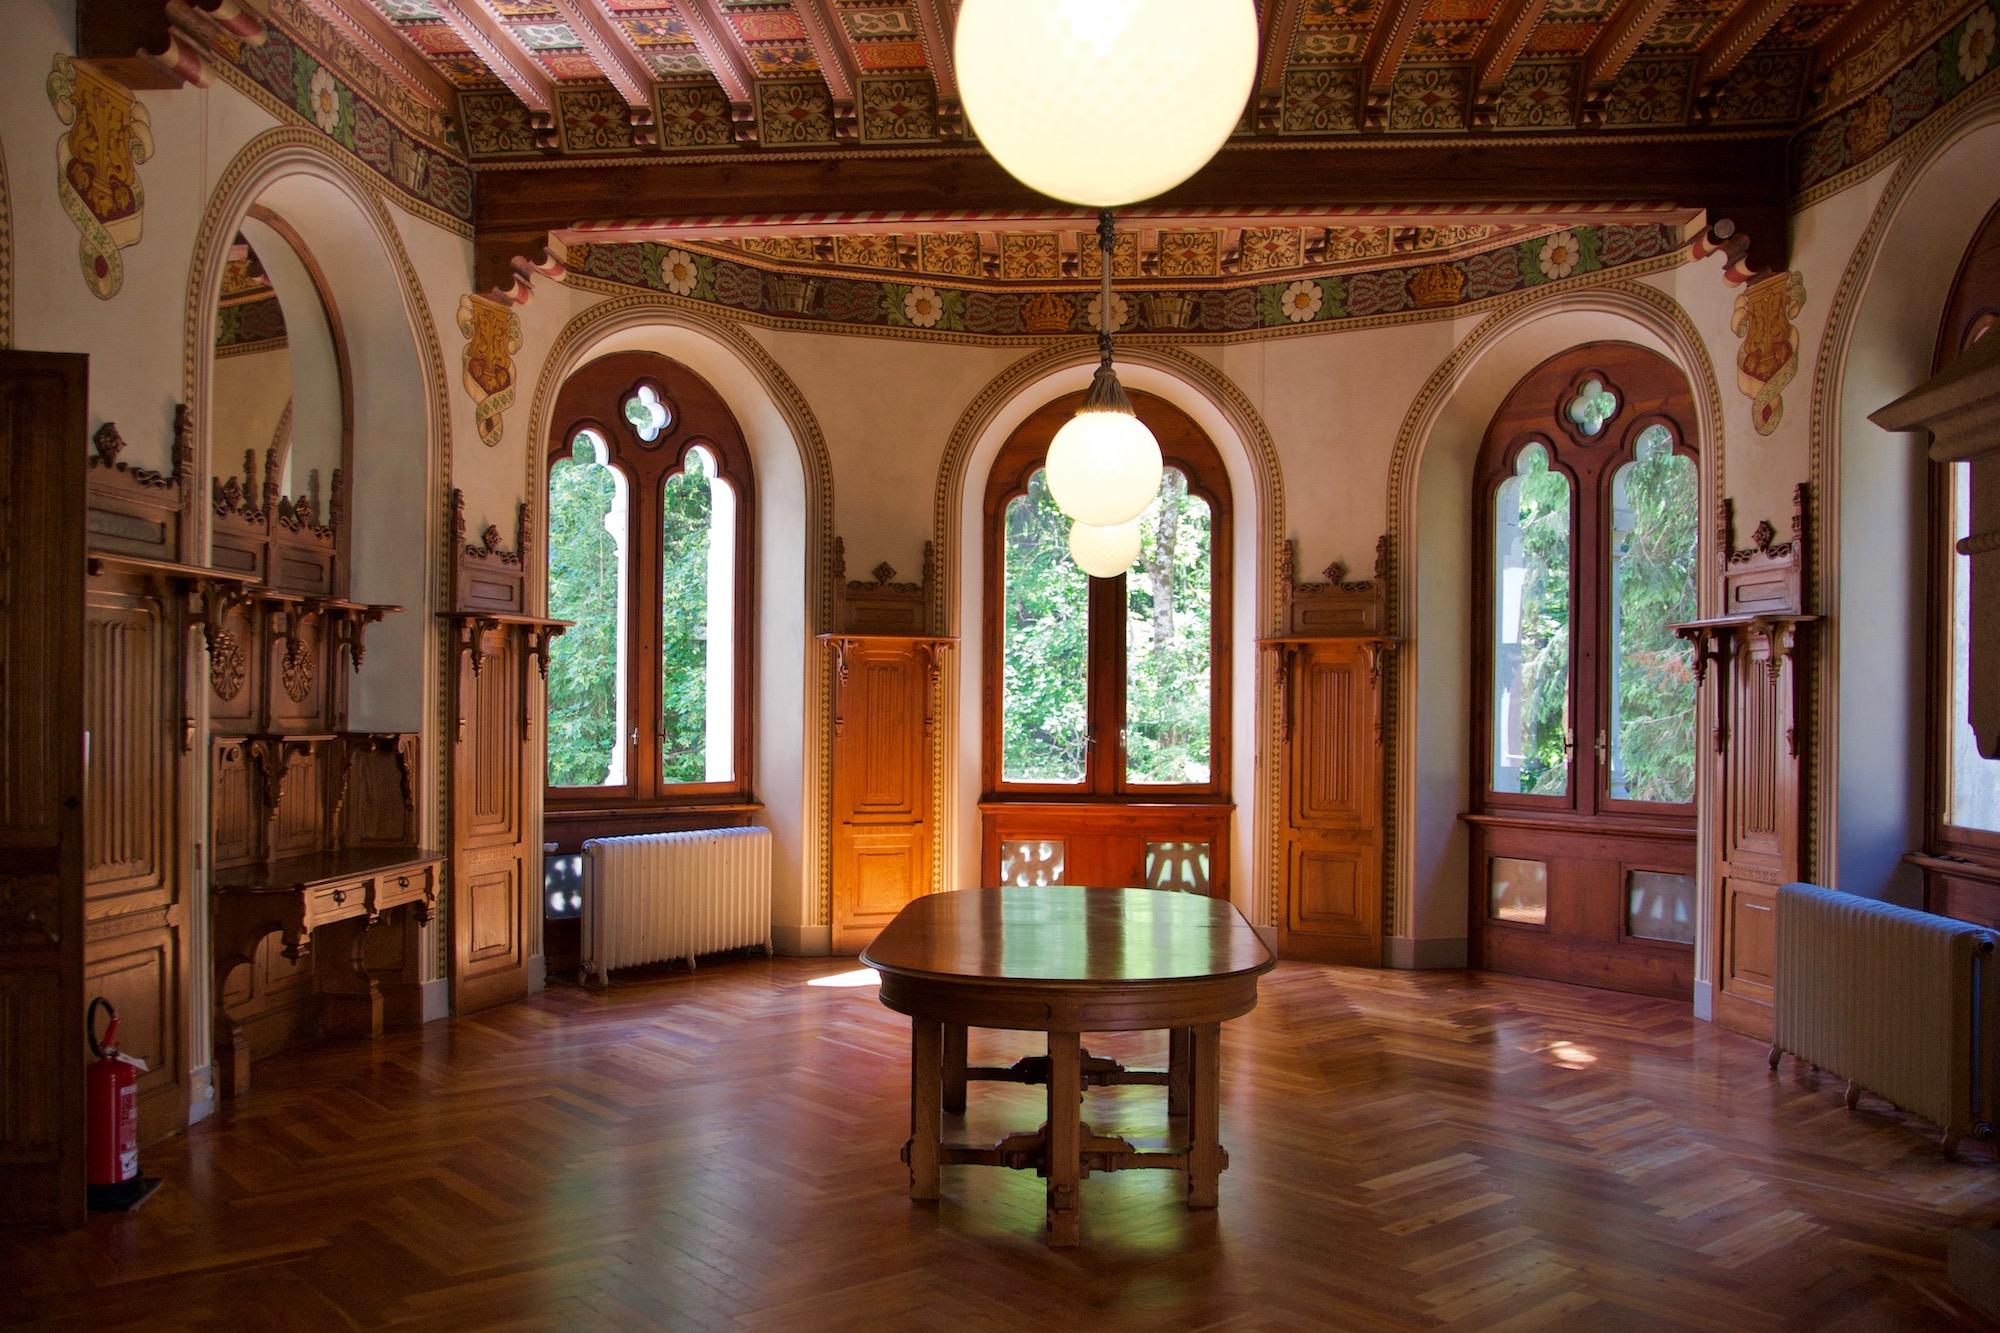 Castel Savoia - Gressoney-Saint-Jean